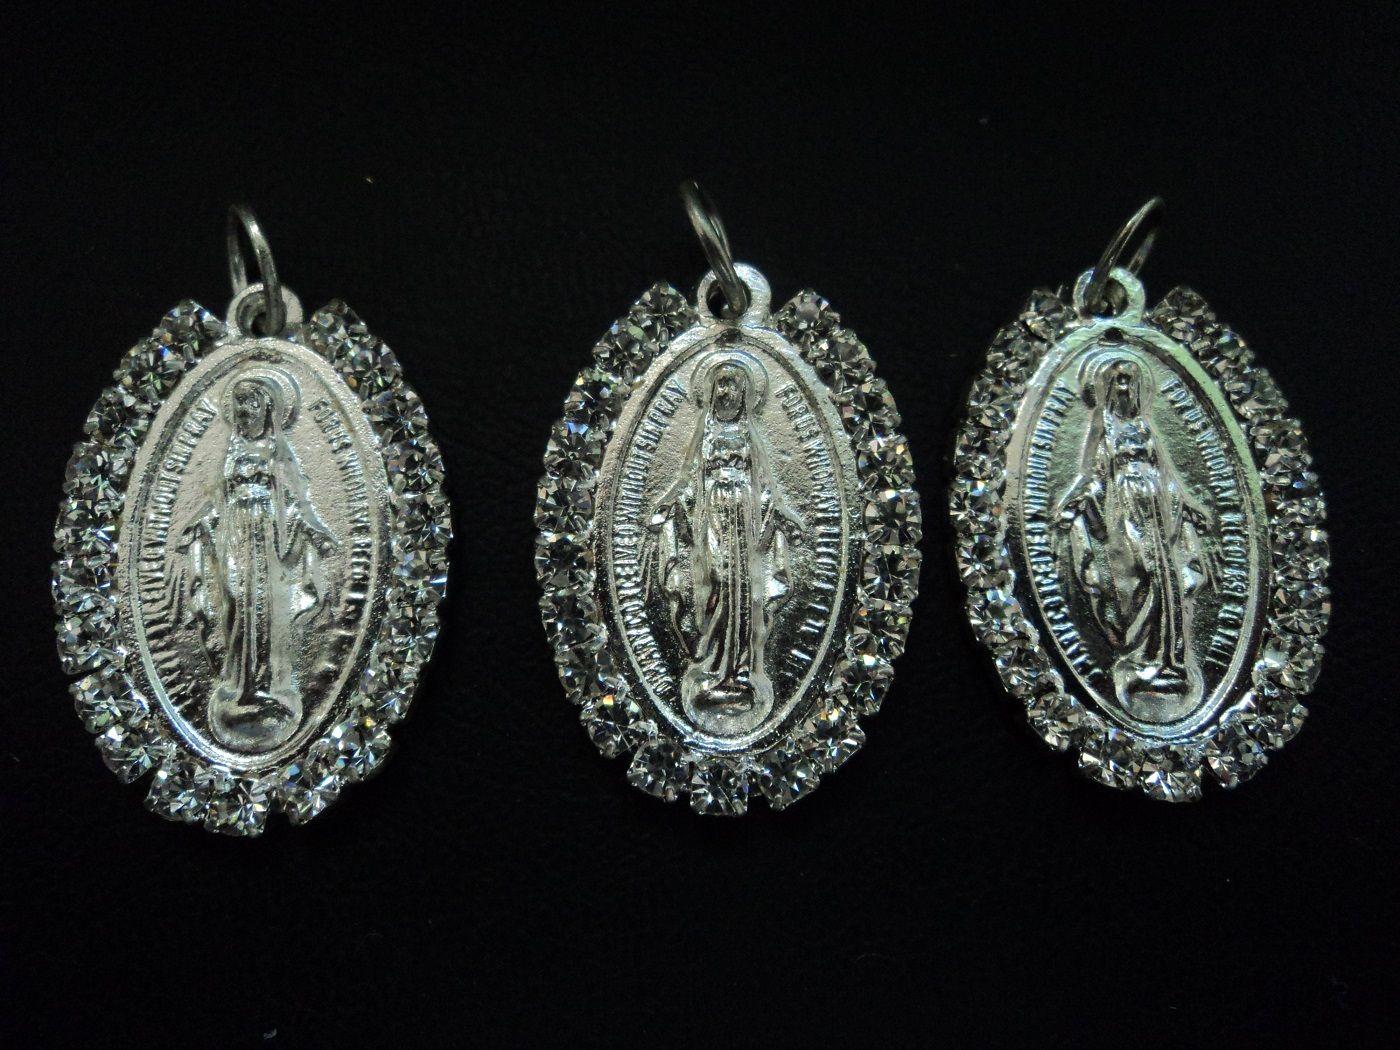 04562a8060cc MVG11 Medalla de la Virgen de Guadalupe plateada fantasia, medidas ...